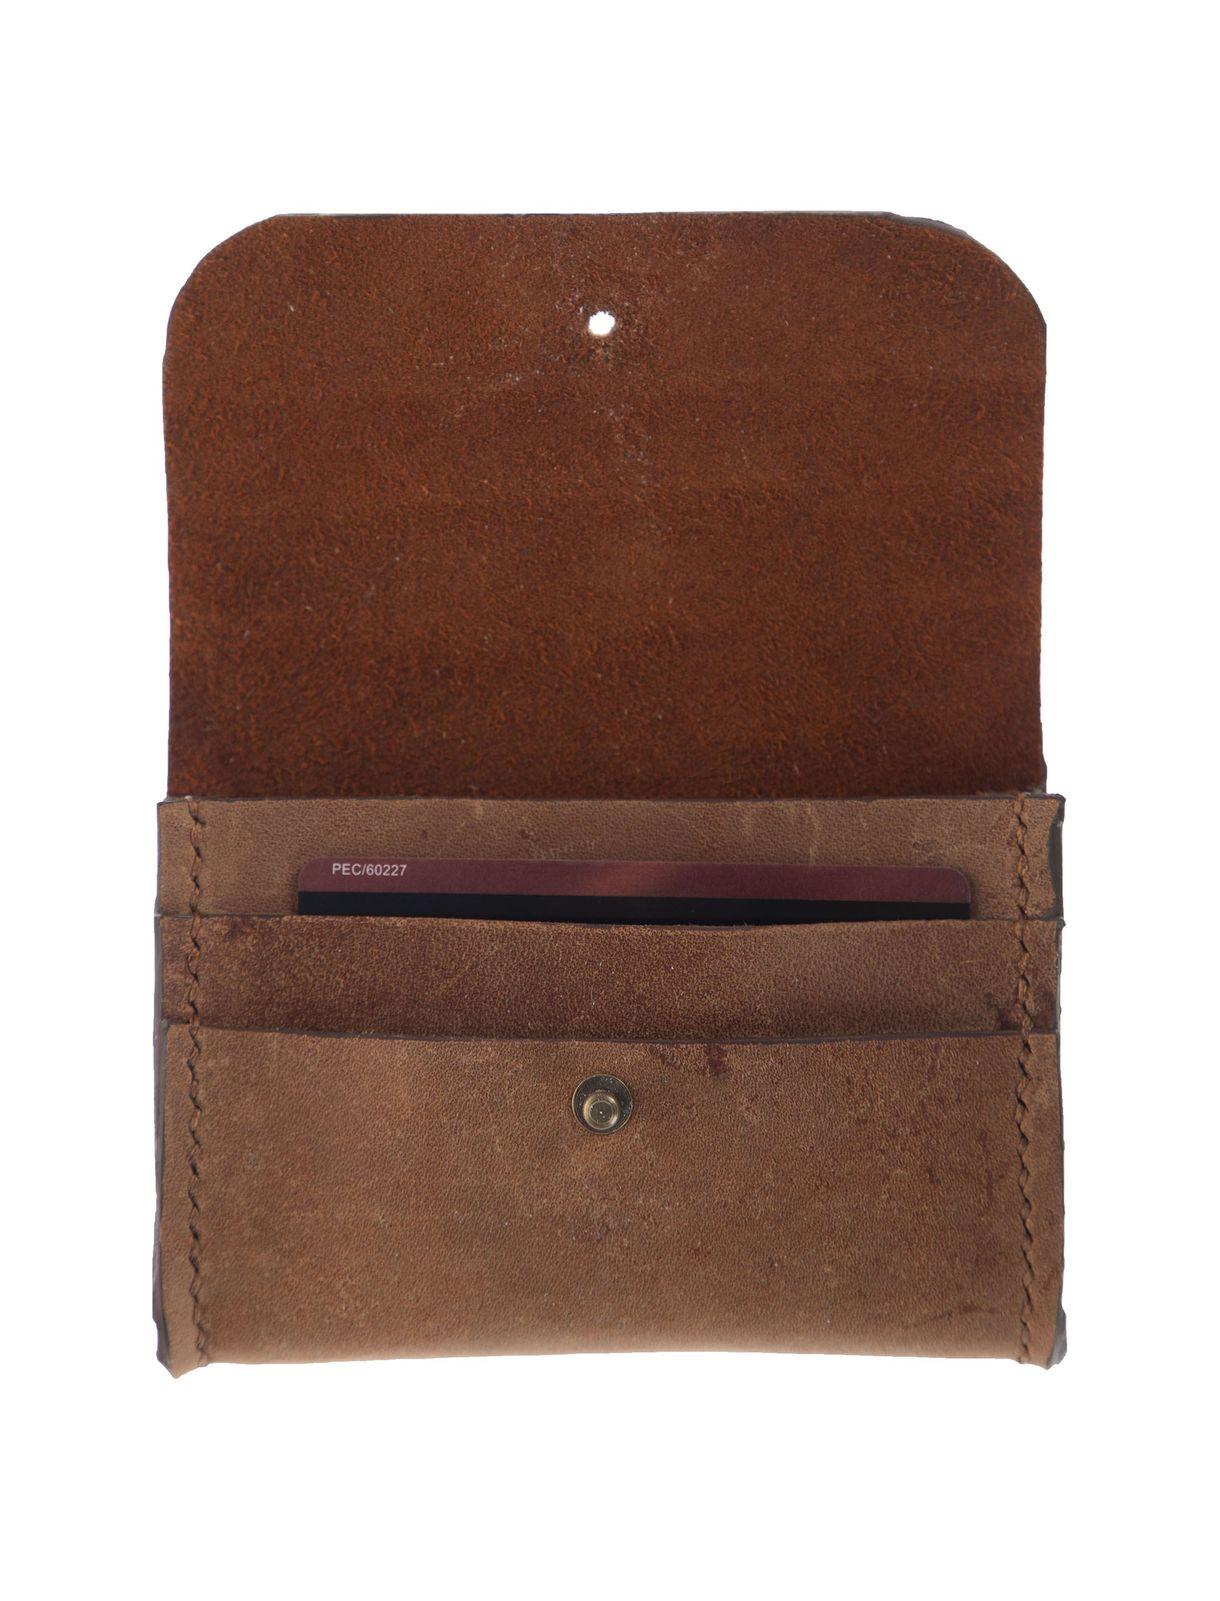 کیف کارت اعتباری چرم بزرگسال - چرم لانکا تک سایز main 1 4